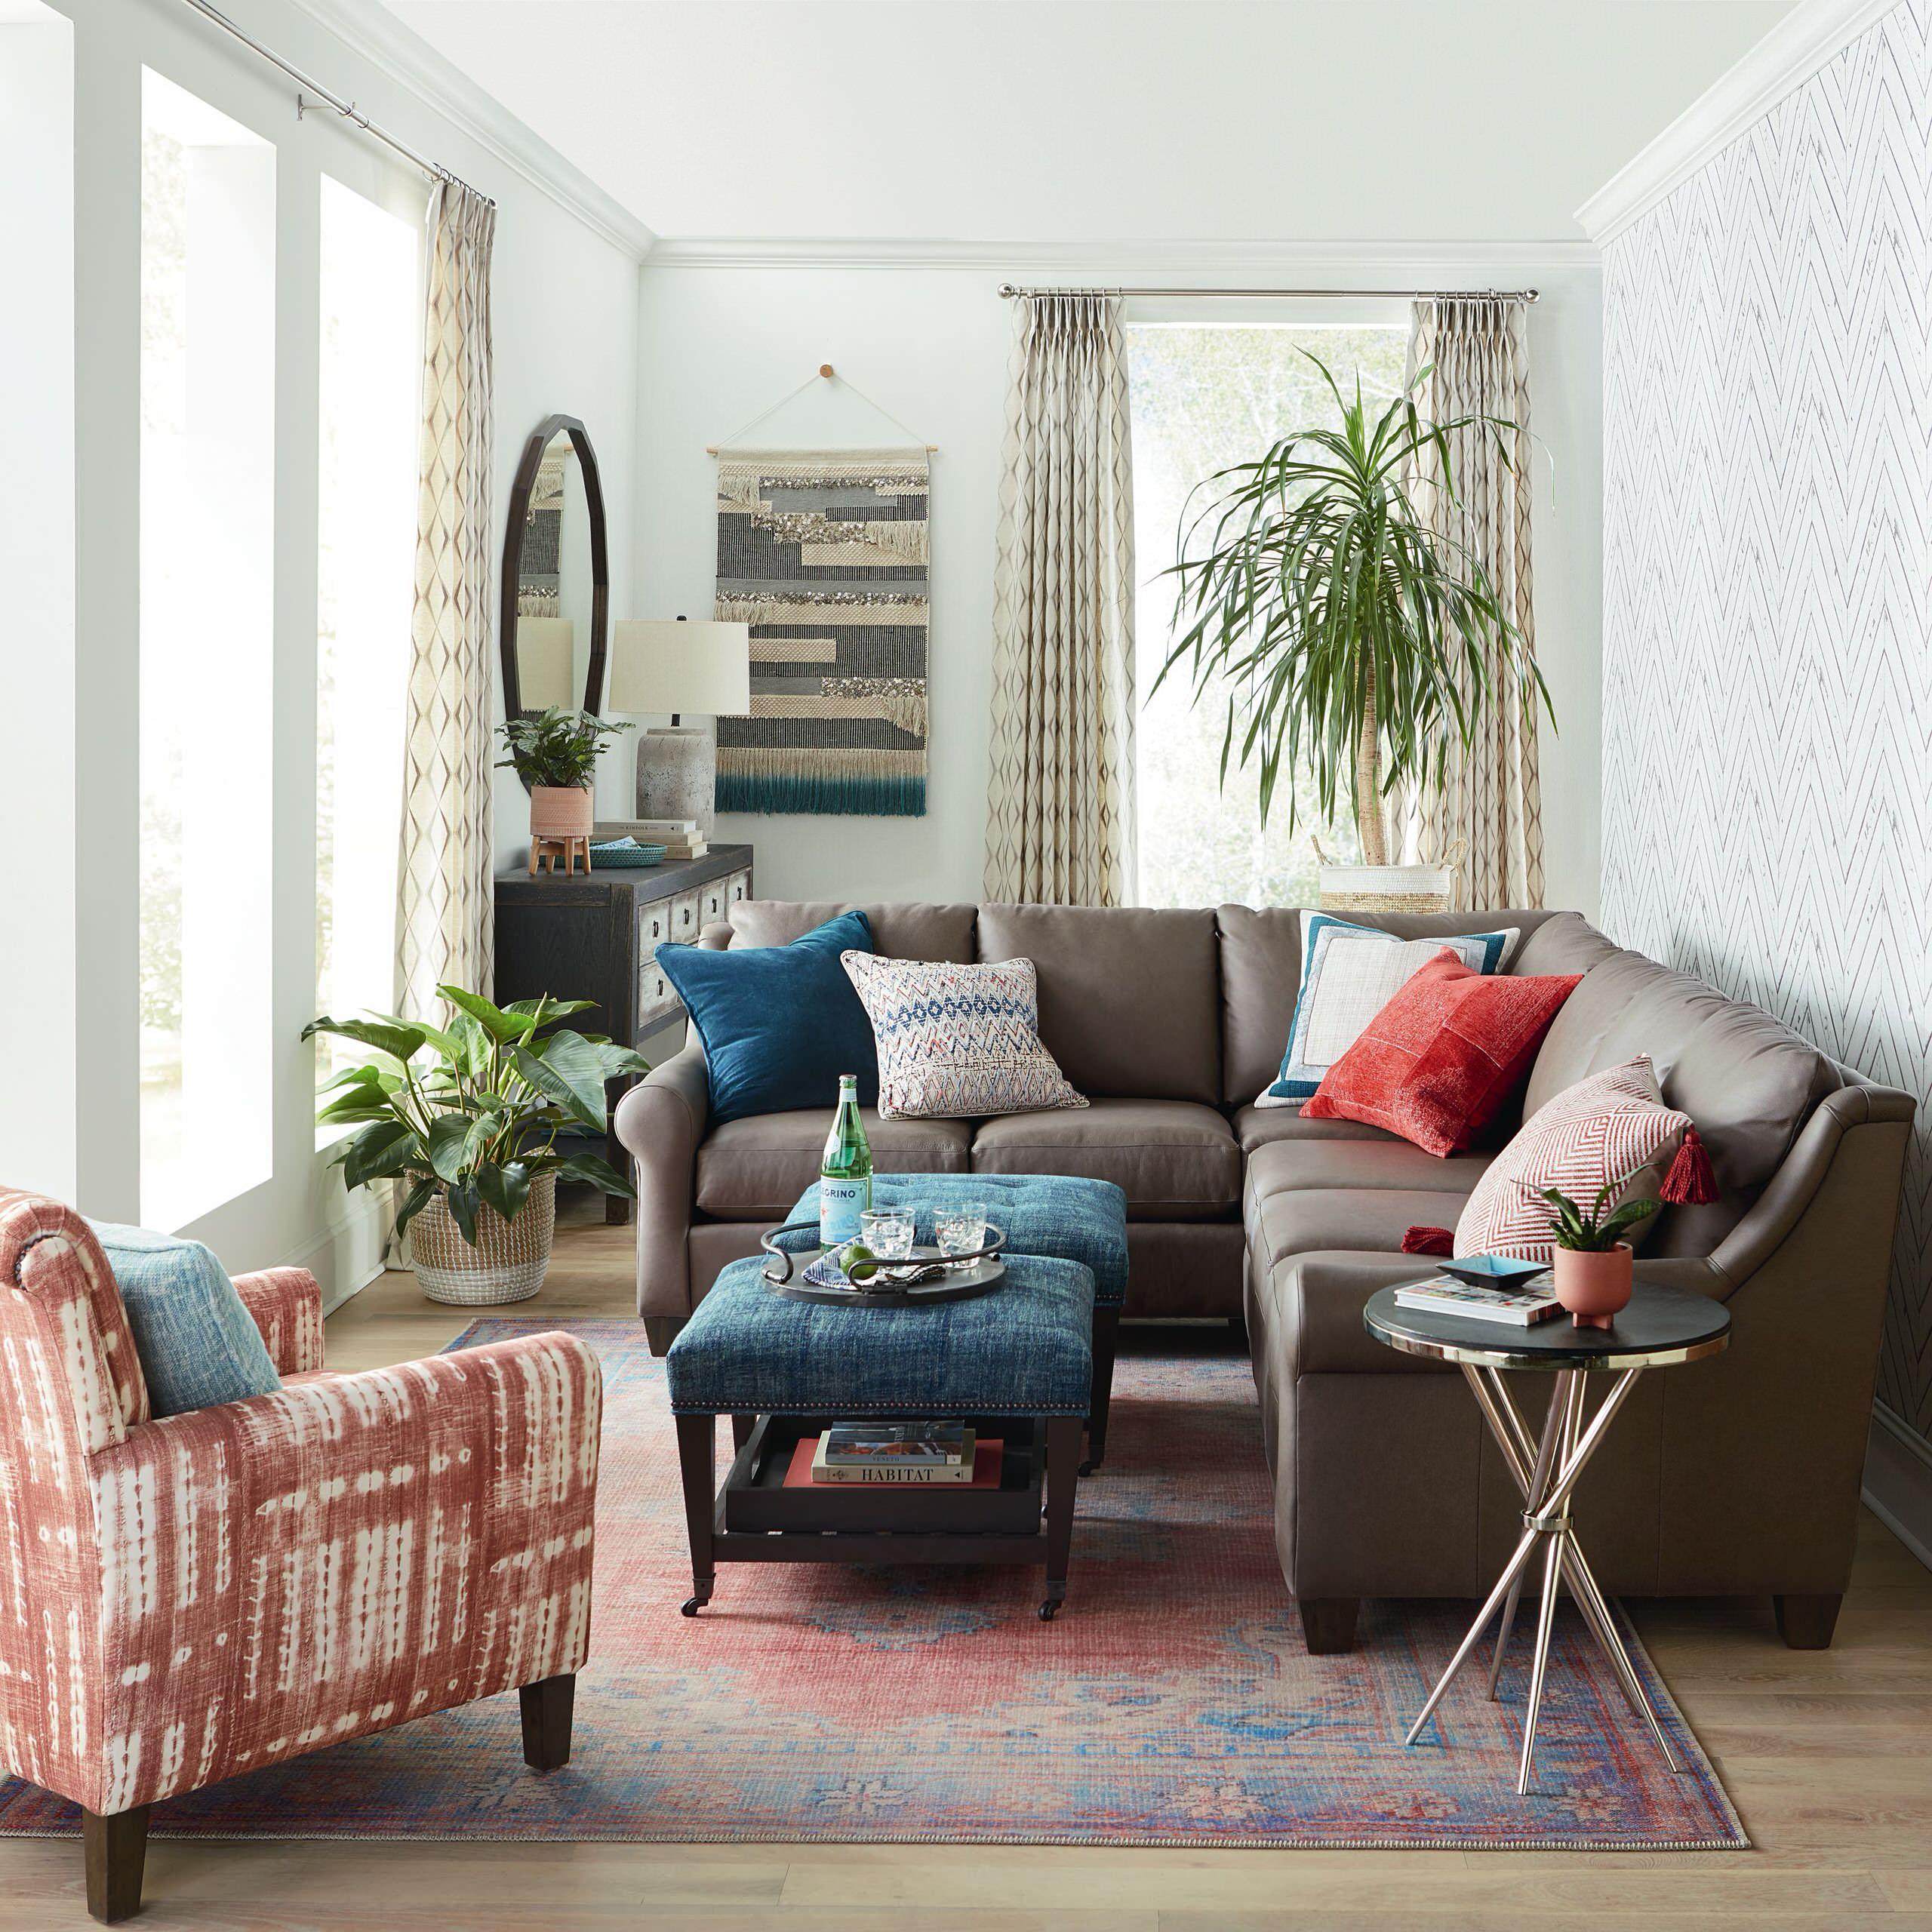 Small L Shape Sofa Ideas & Photos | Houzz